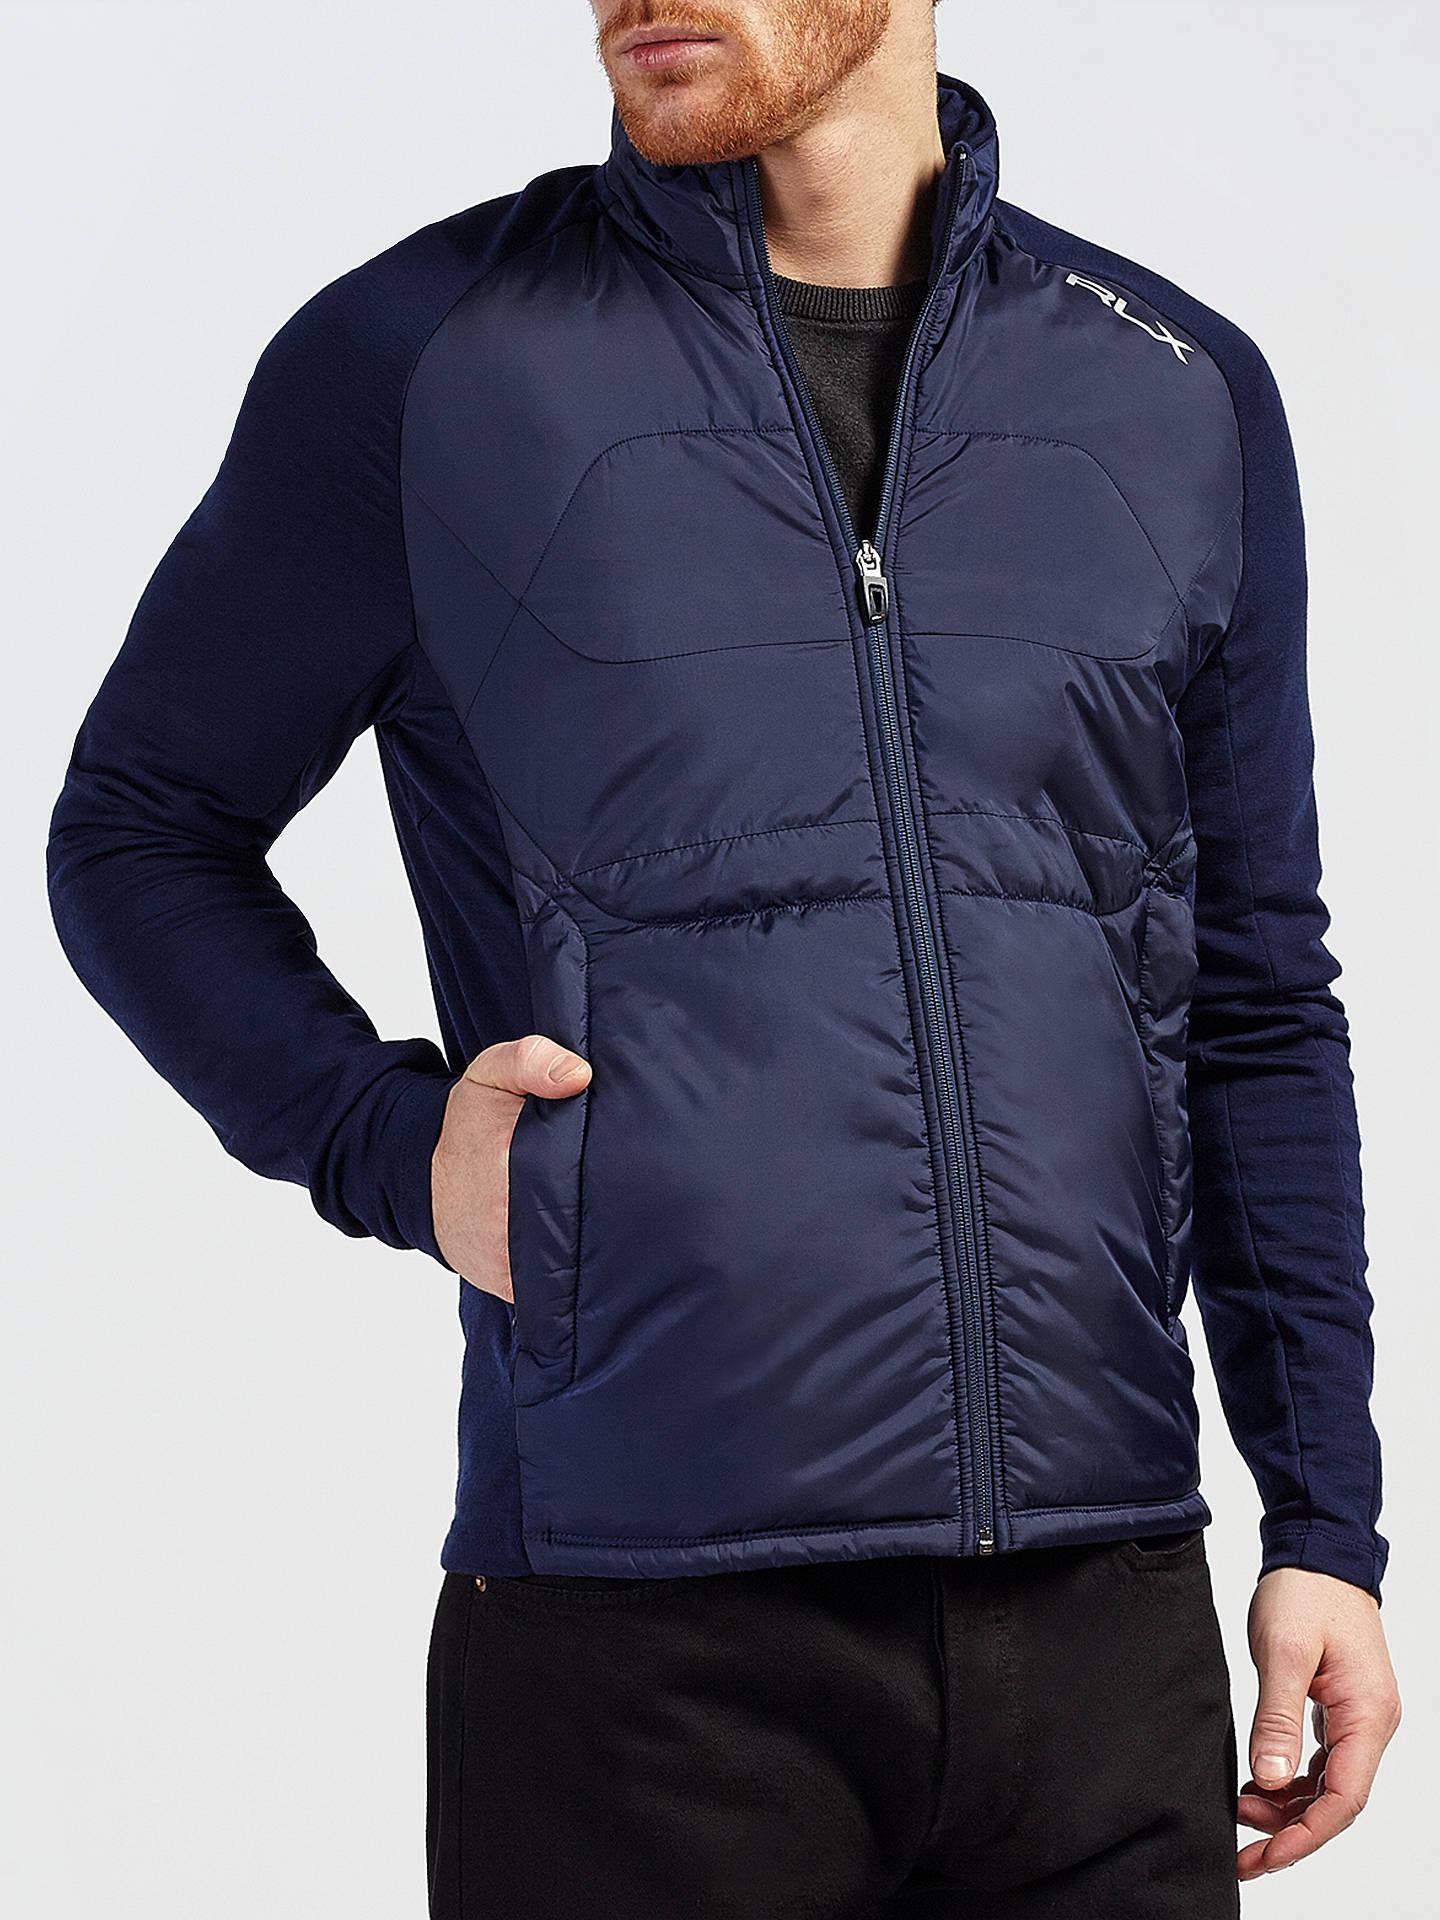 752fe327c Buy Polo Golf by Ralph Lauren RLX Stretch Wool Jacket